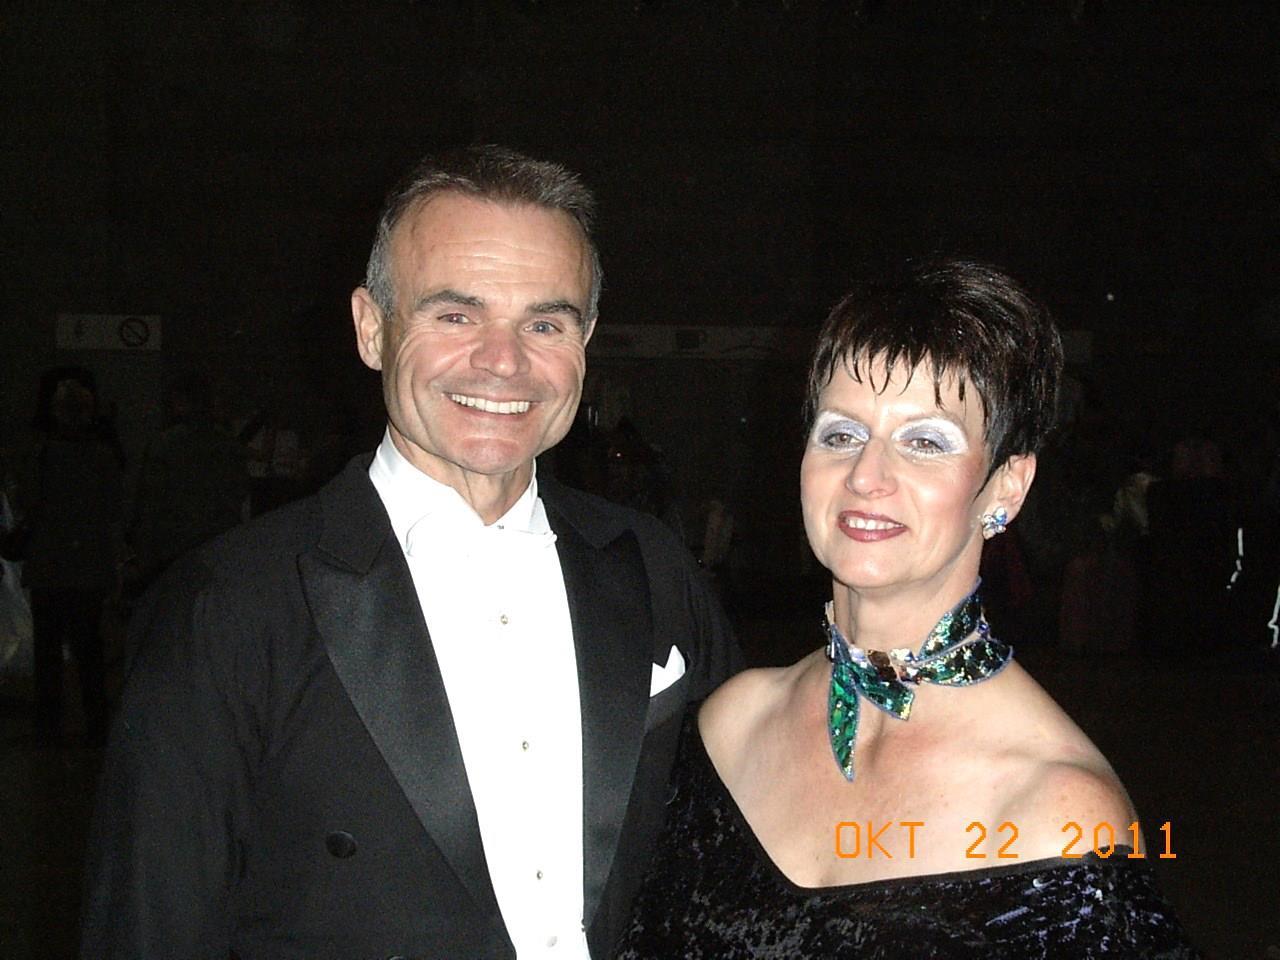 Karin-Maier-mit-Ehemann-Peter-Maier